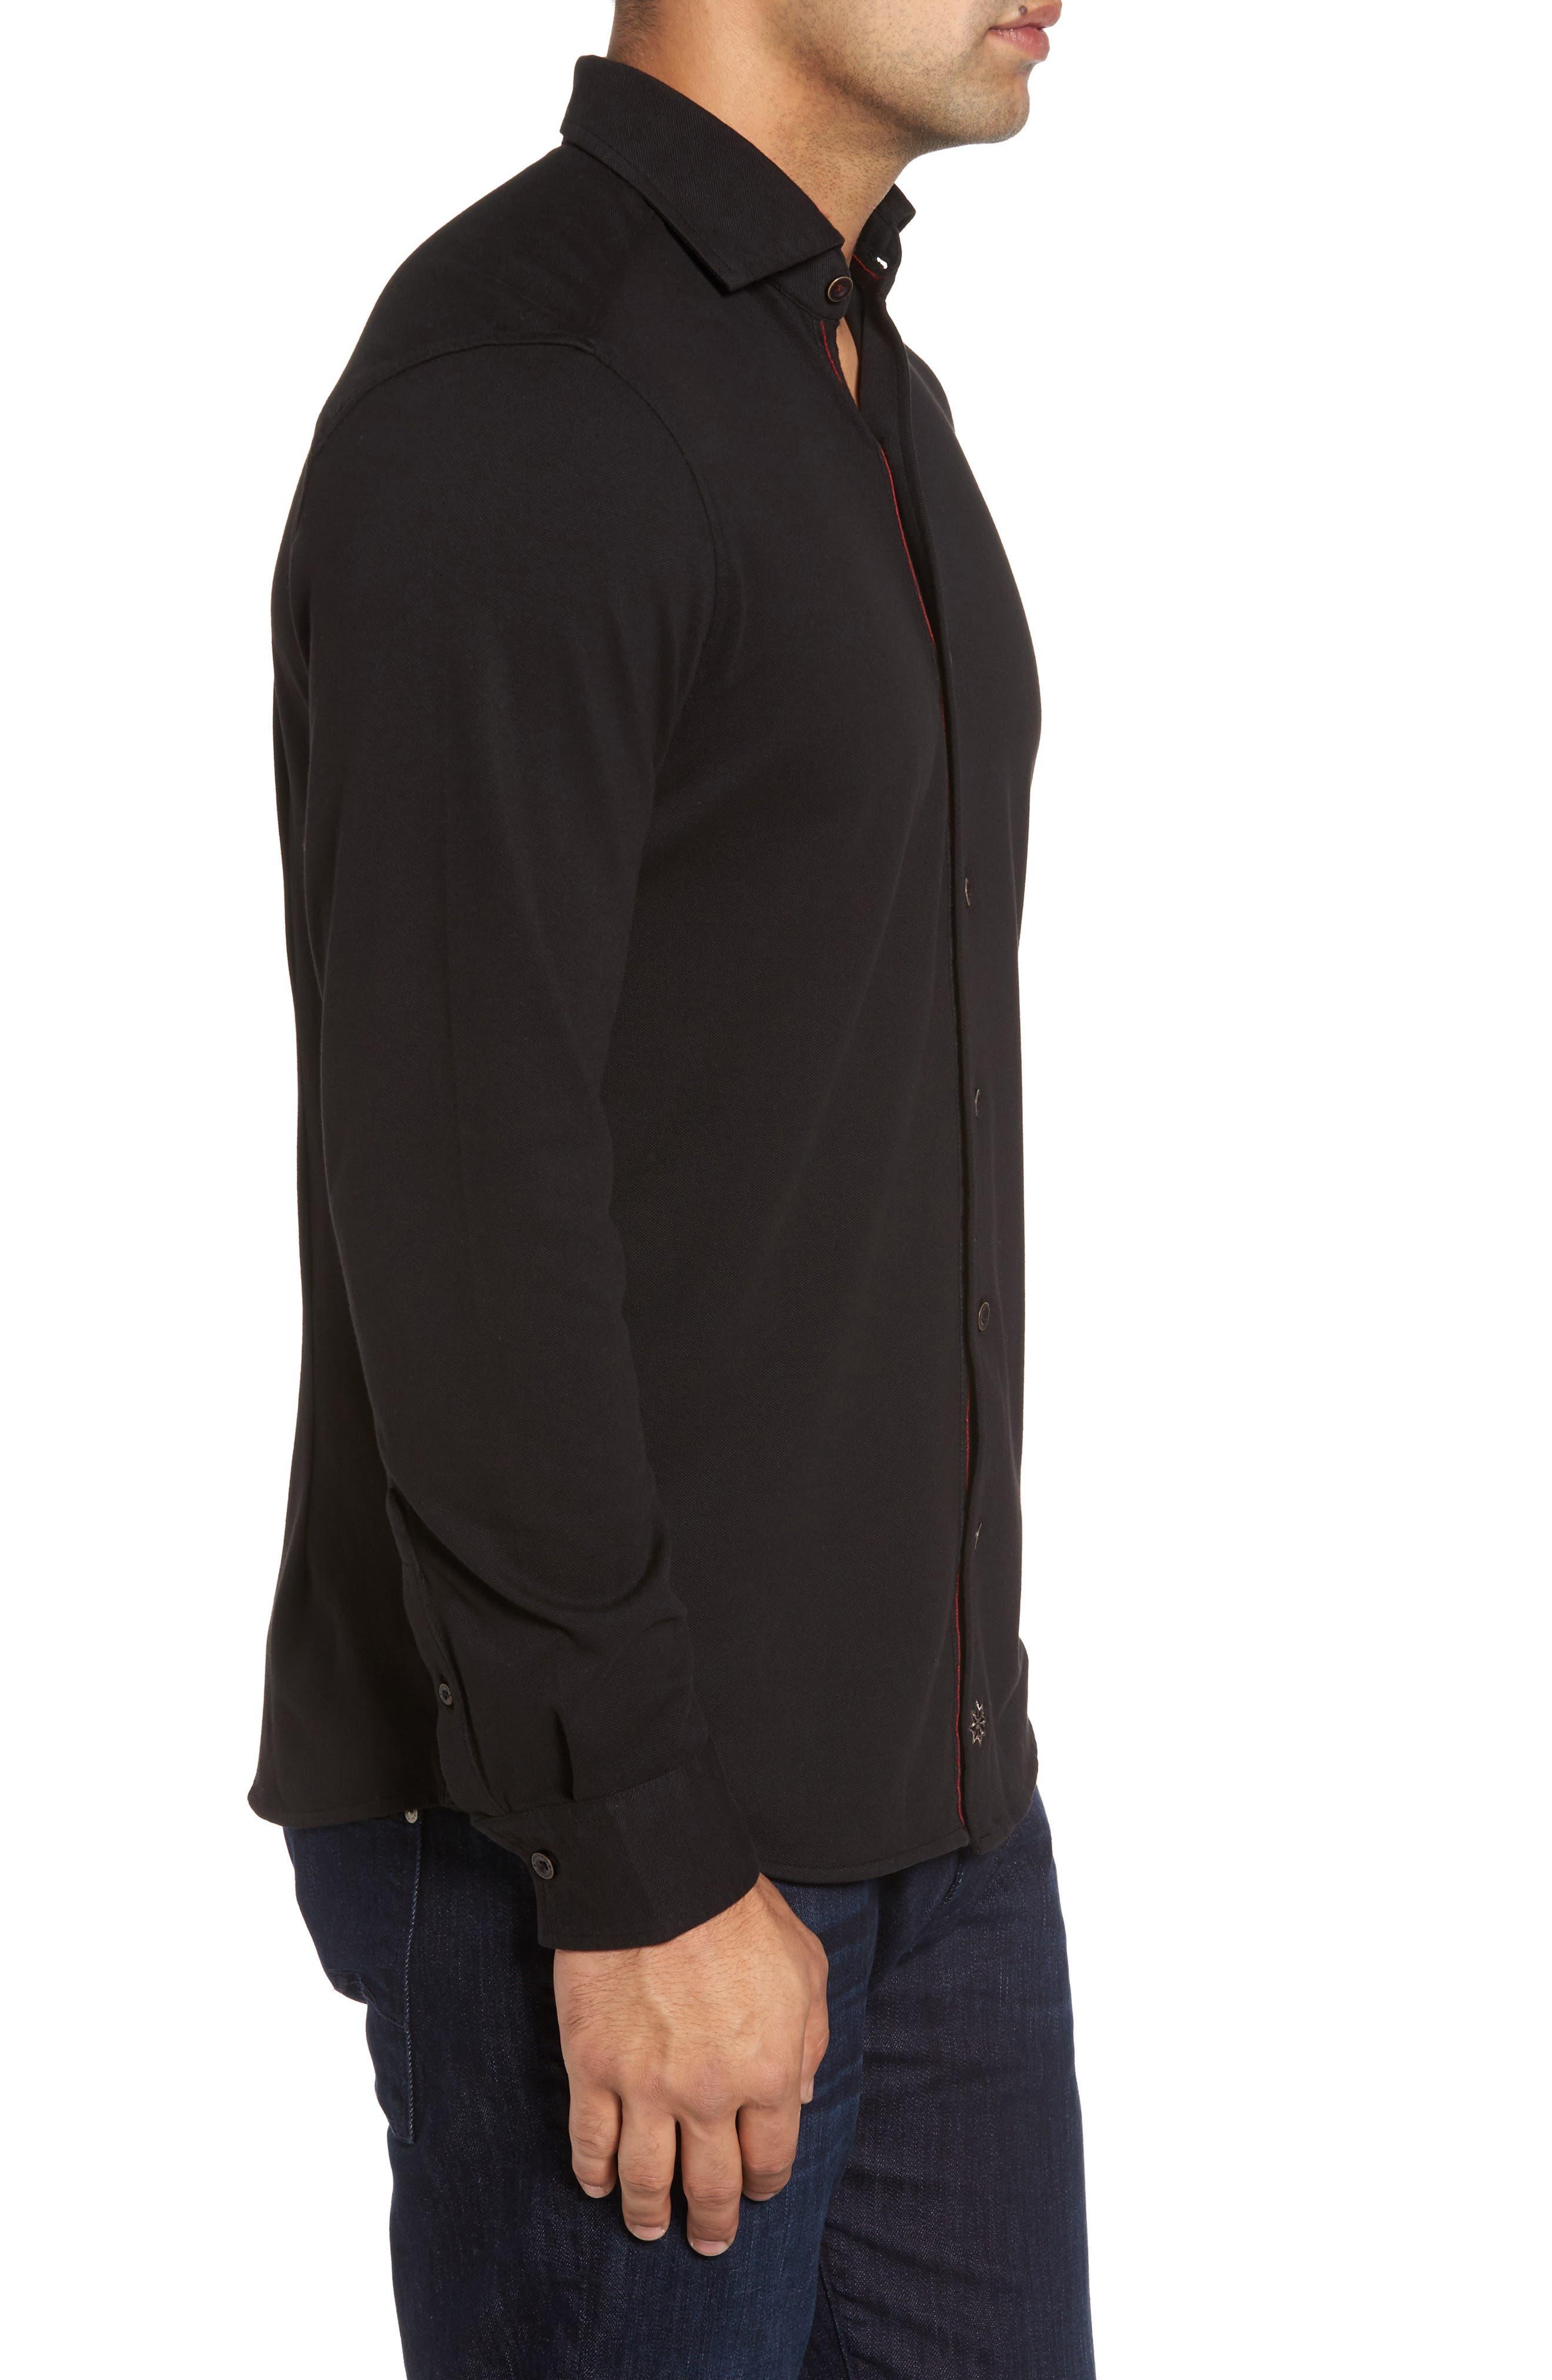 Shively Piqué Knit Sport Shirt,                             Alternate thumbnail 3, color,                             001